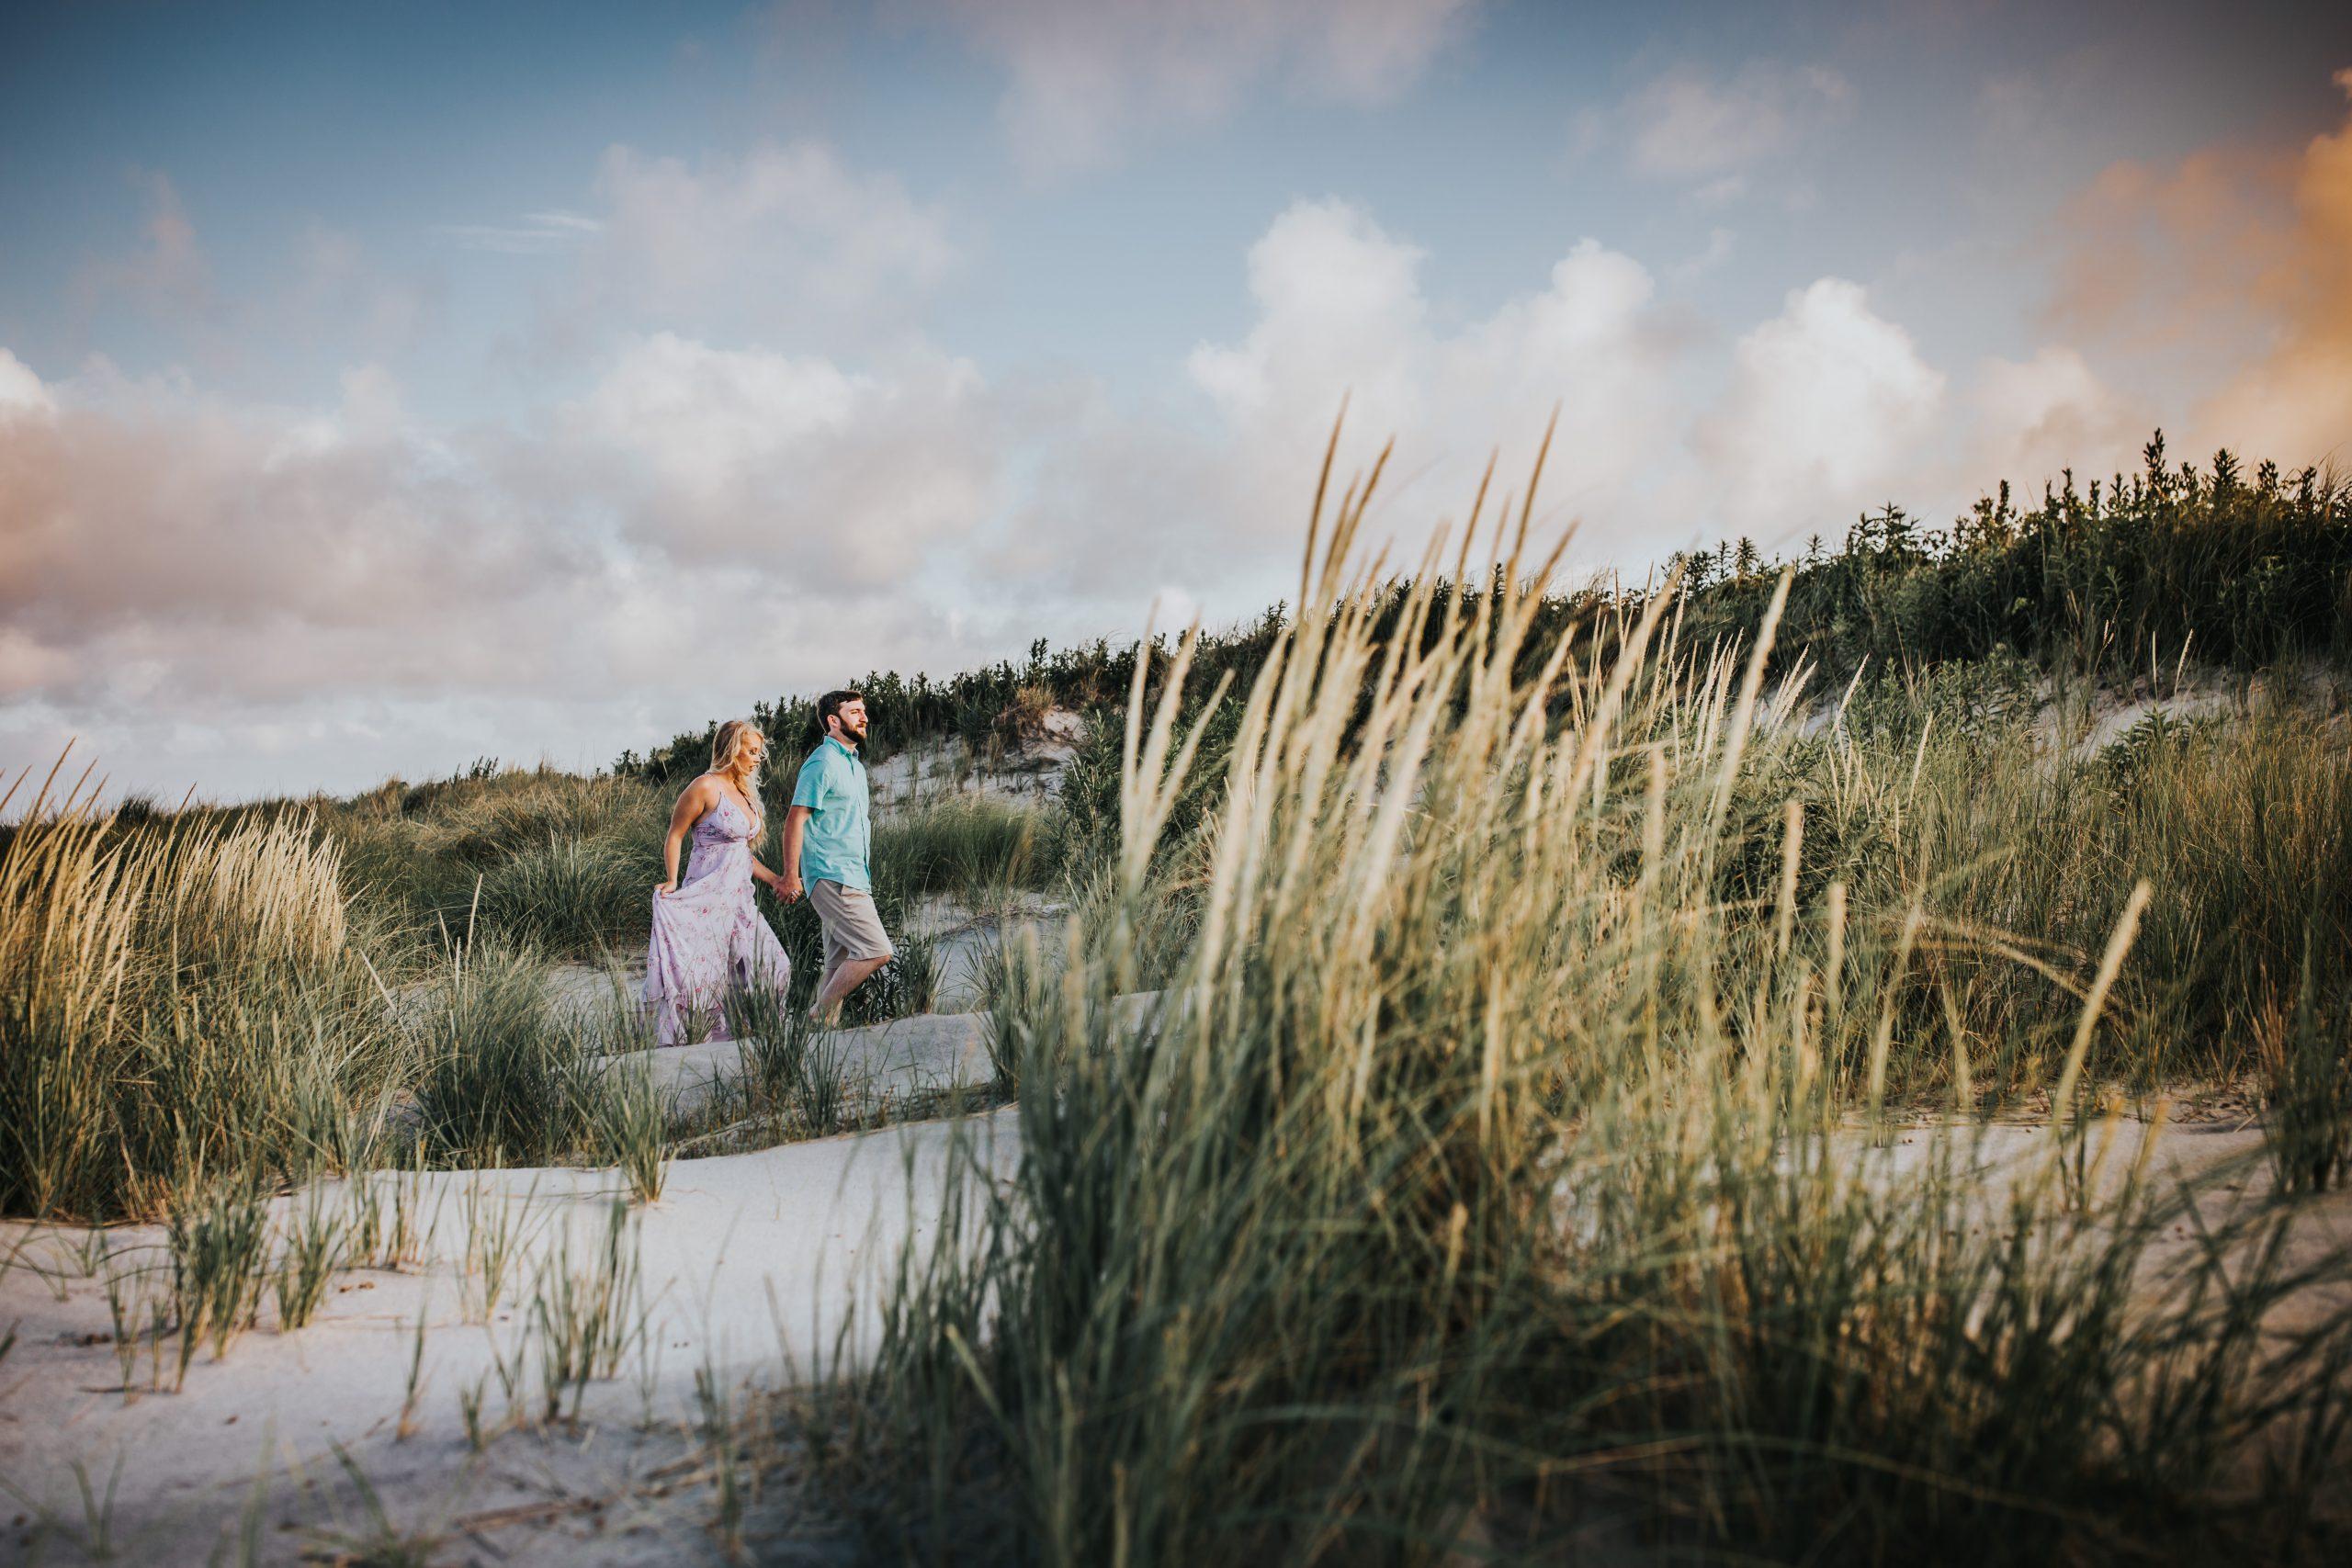 New-Jersey-Wedding-Photographer-Jenna-Lynn-Photography-NJengagement-OceanCity-RhiannonPaul-23